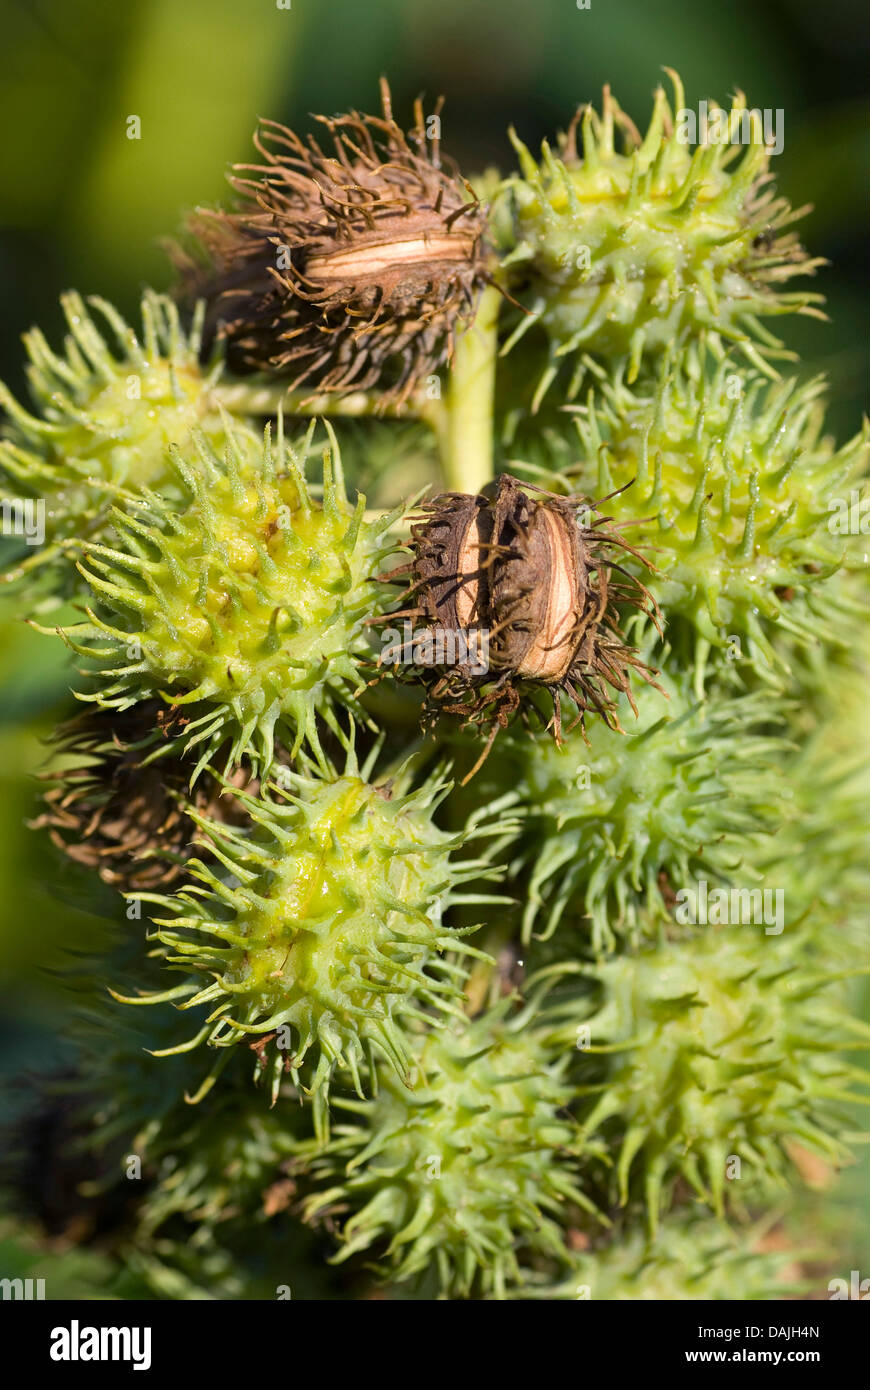 Castor-oil Plant, Castor Oil Plant, Ricin, Castor Bean